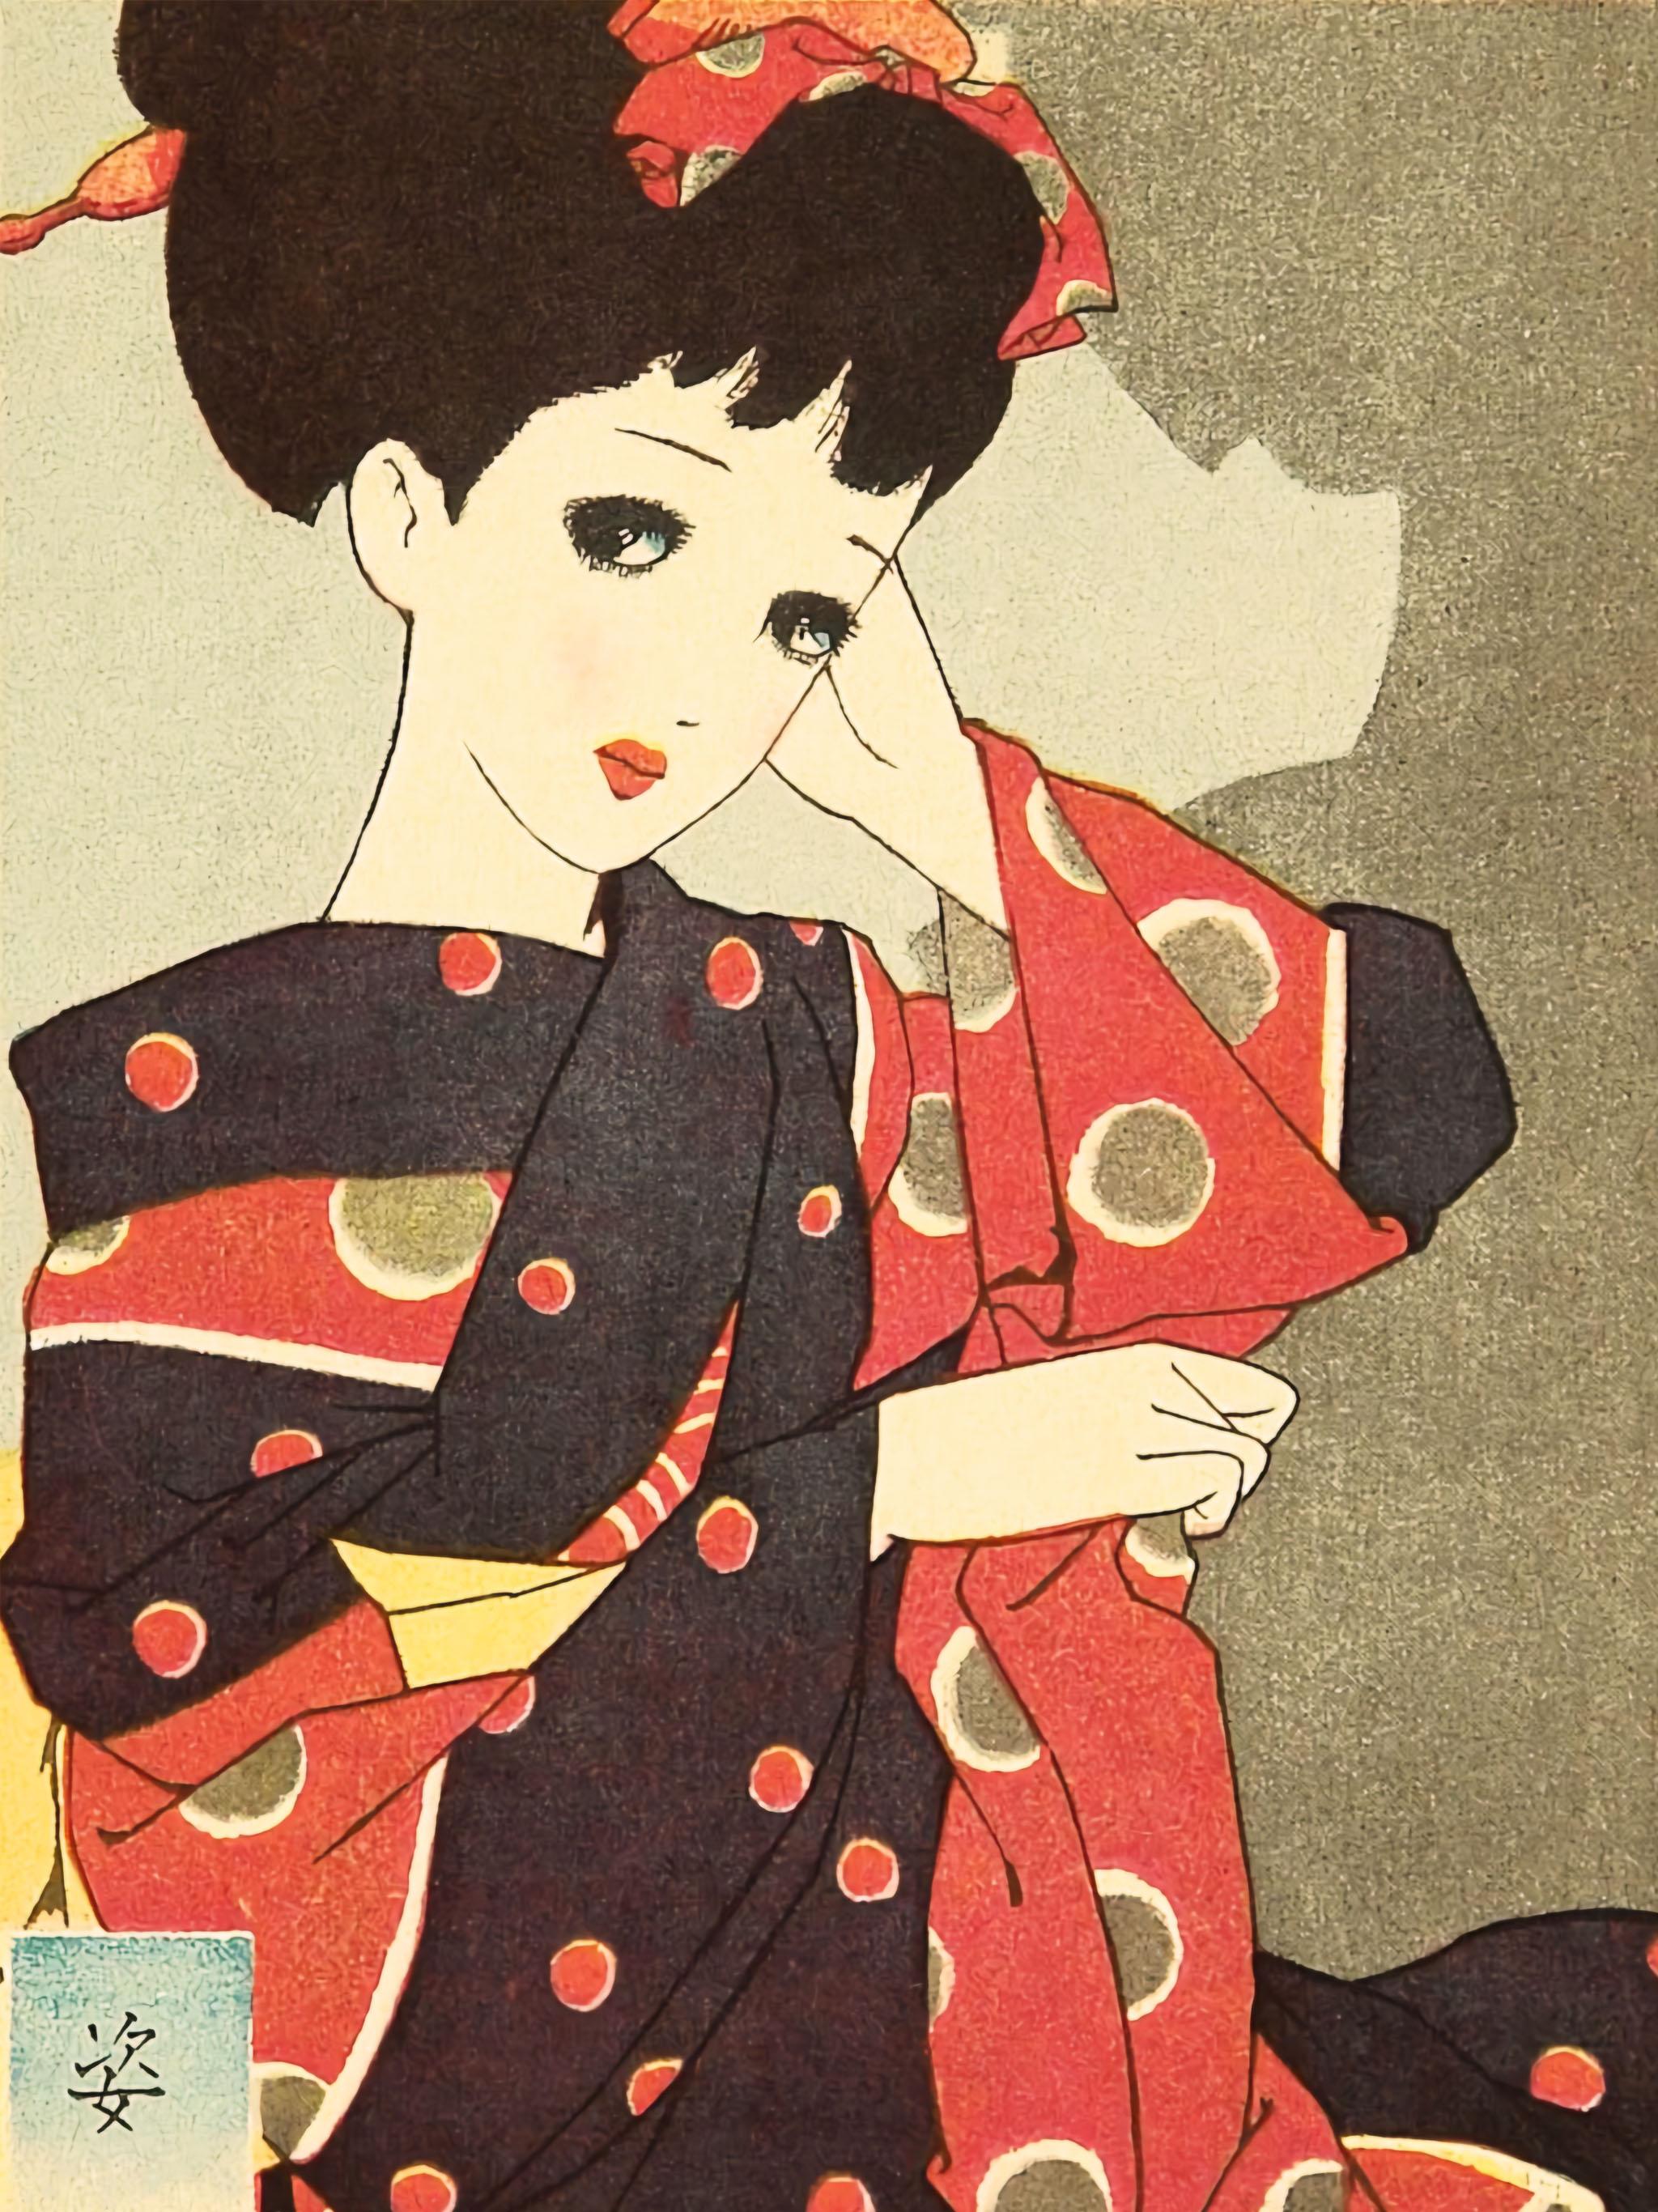 Nakahara Junichi - Sugata 2048x2732